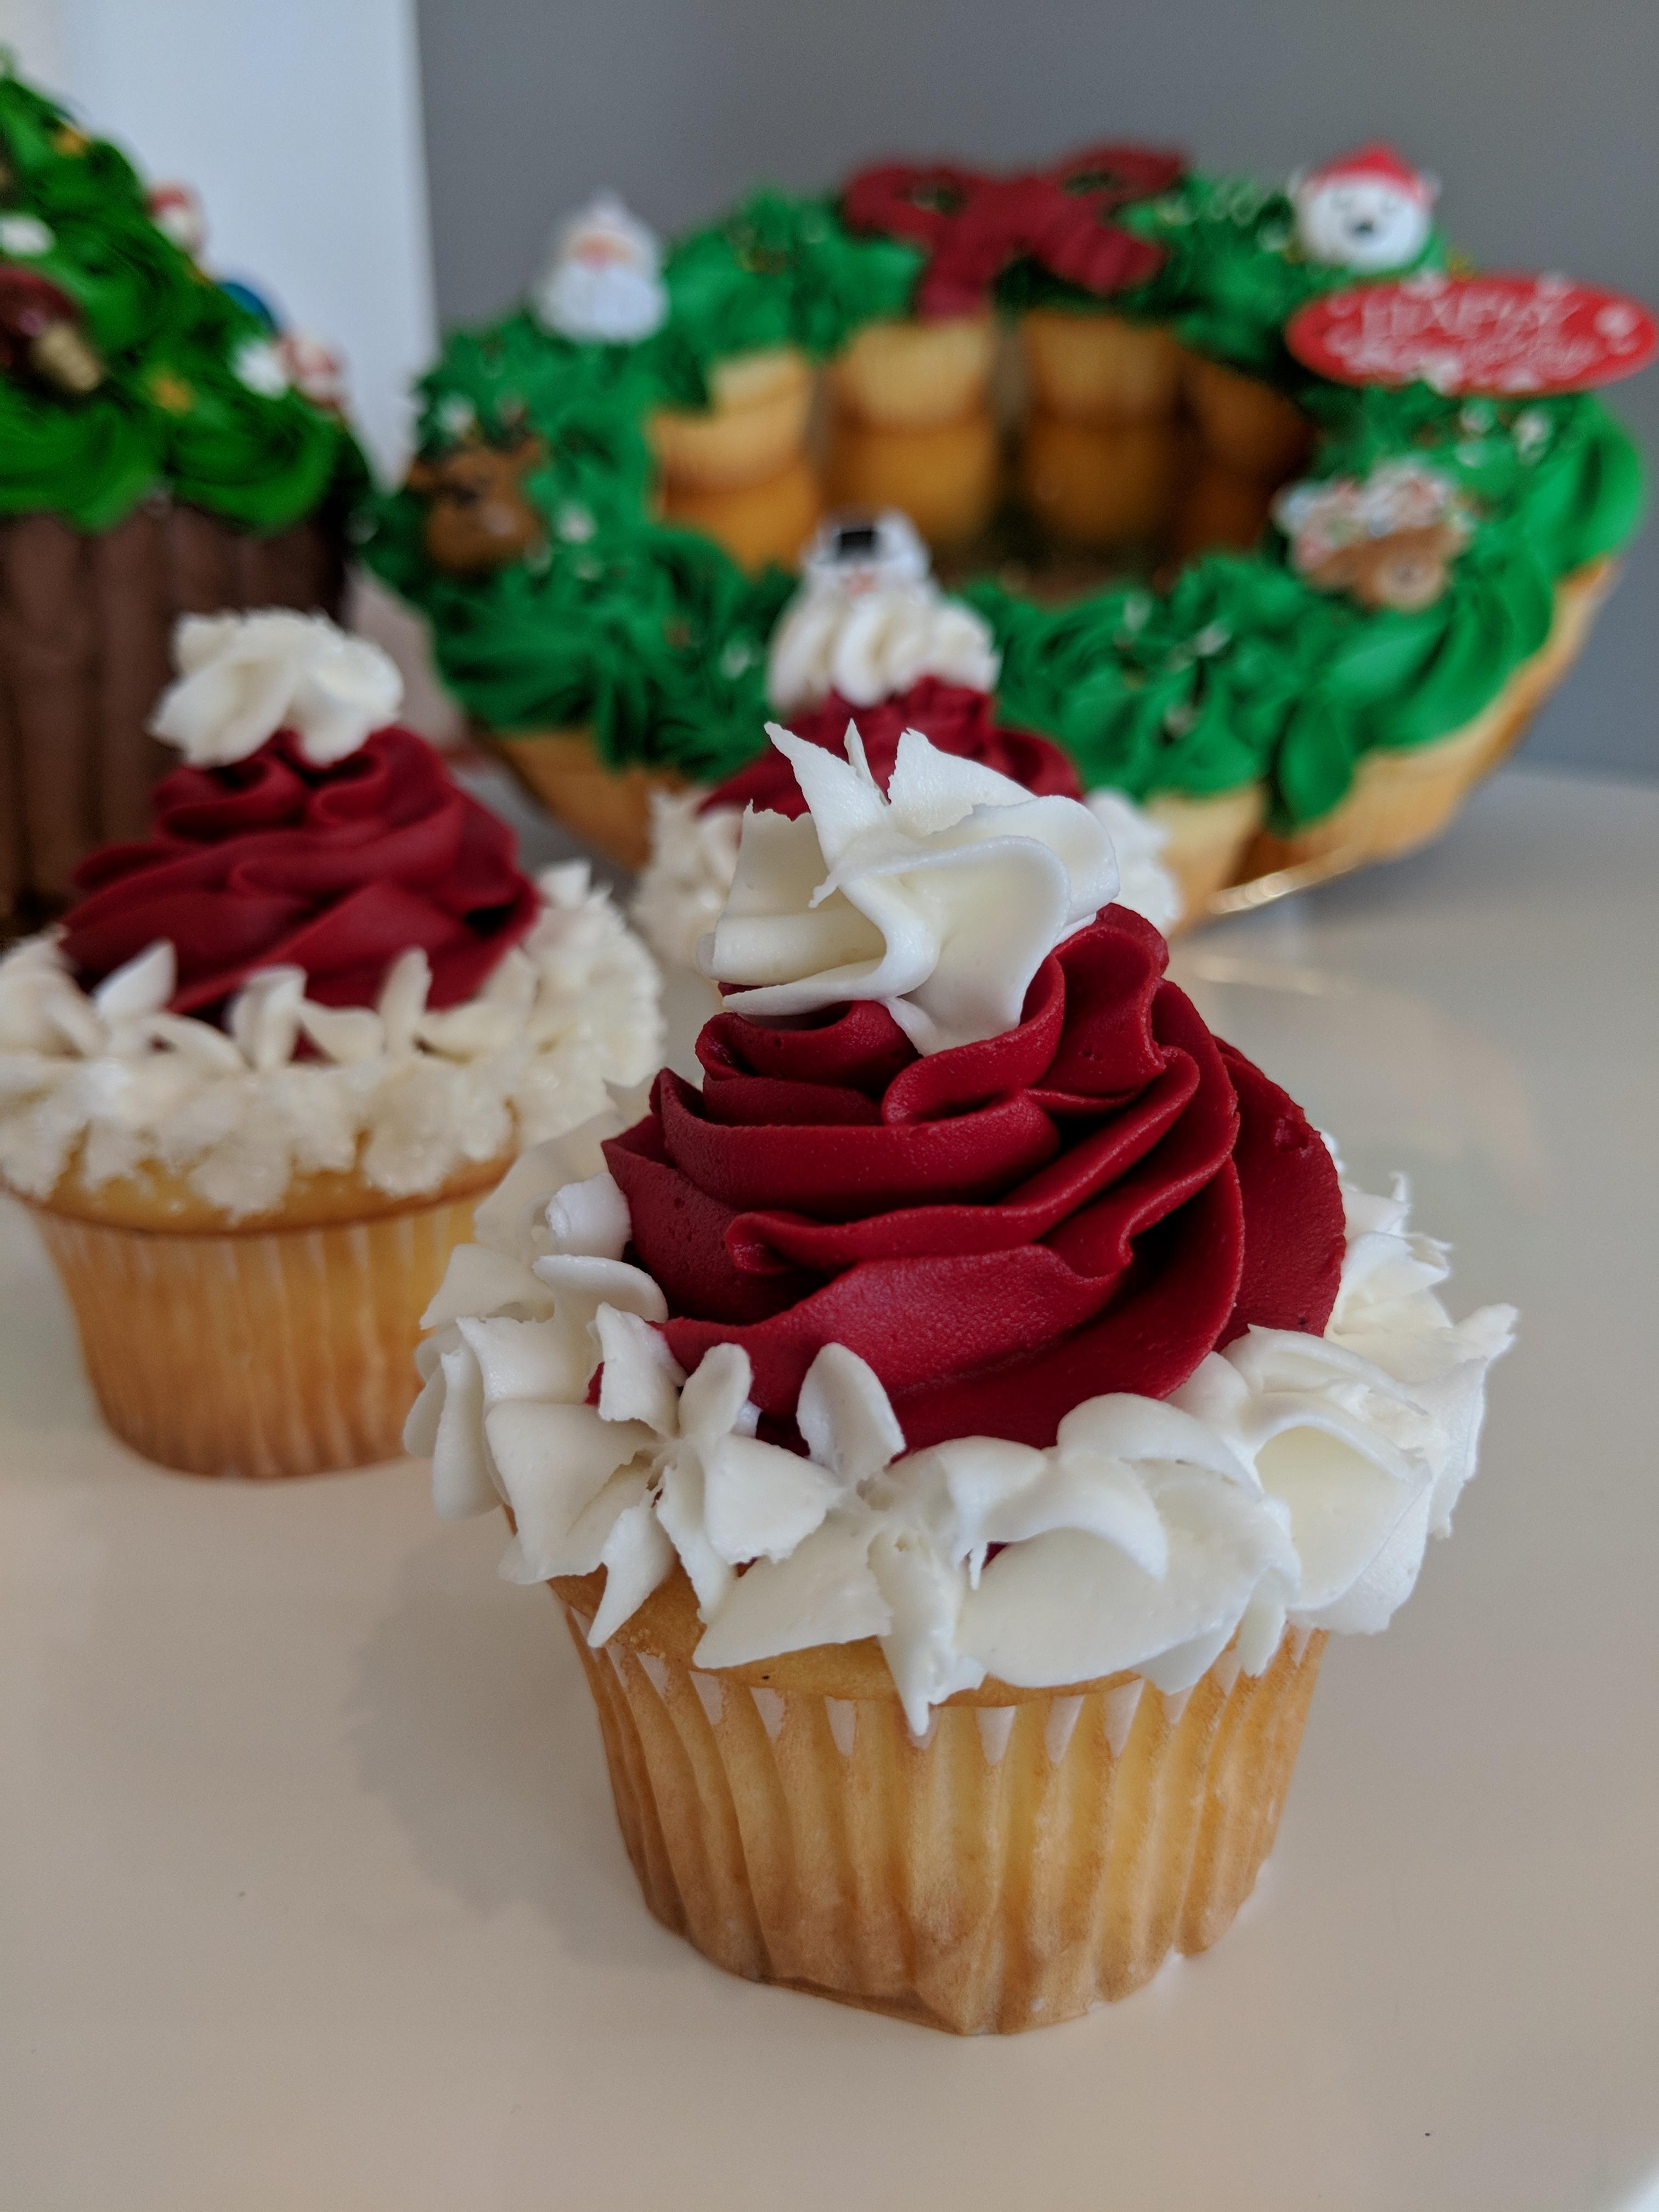 Santa Hat Cupcake $3.50